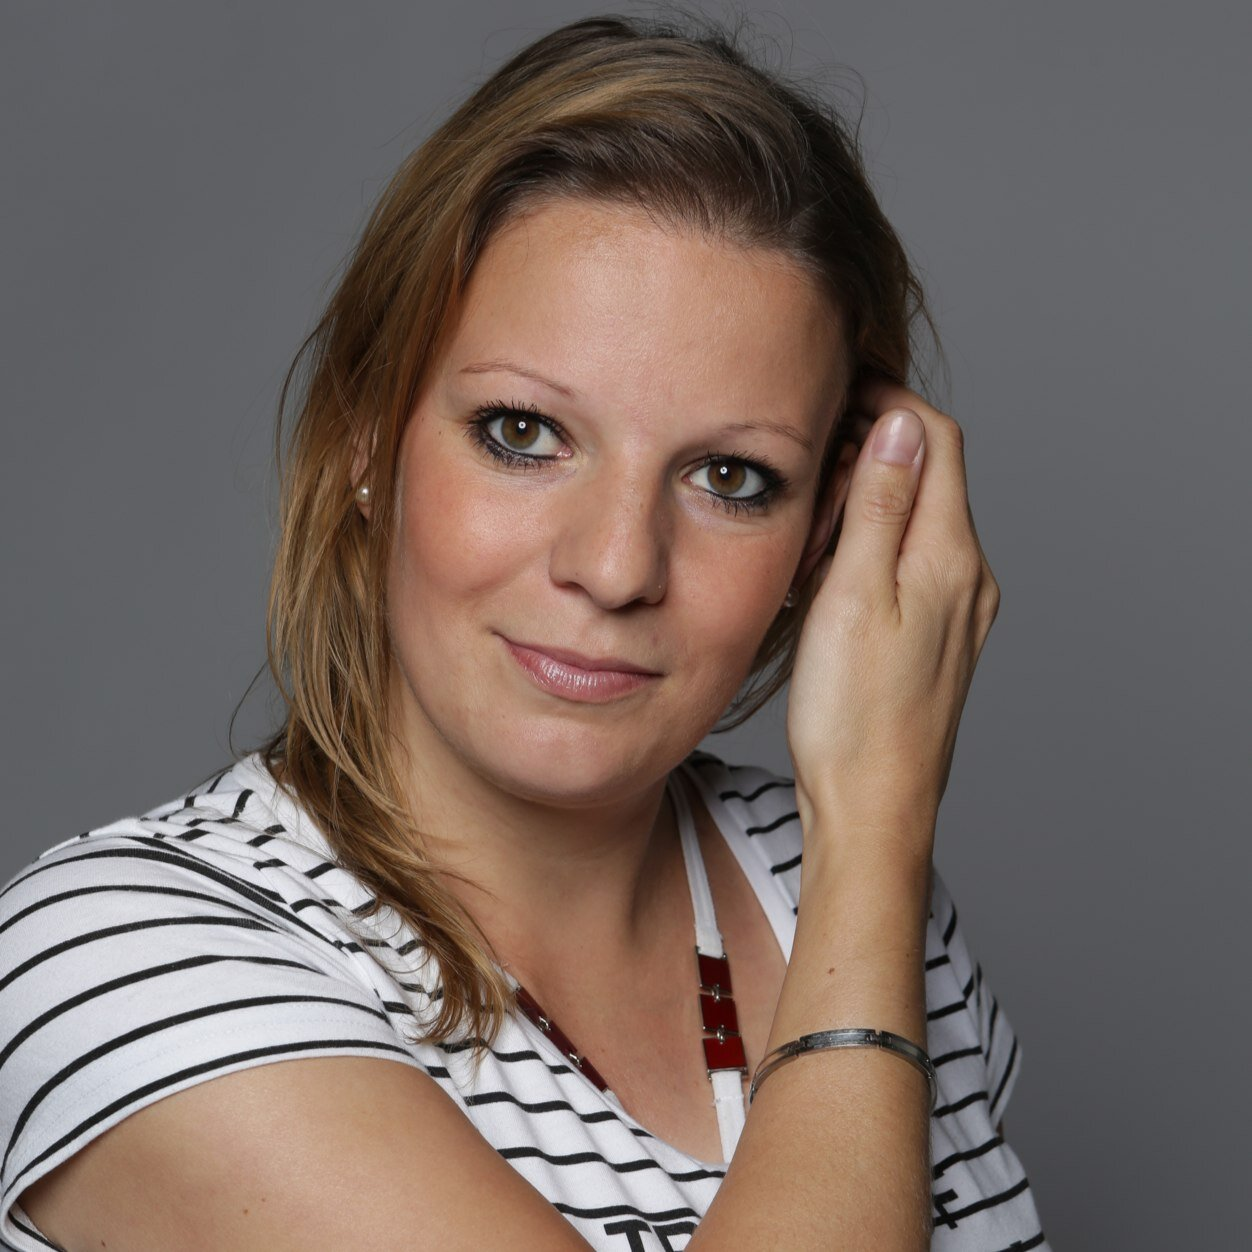 Lucie Horinkova